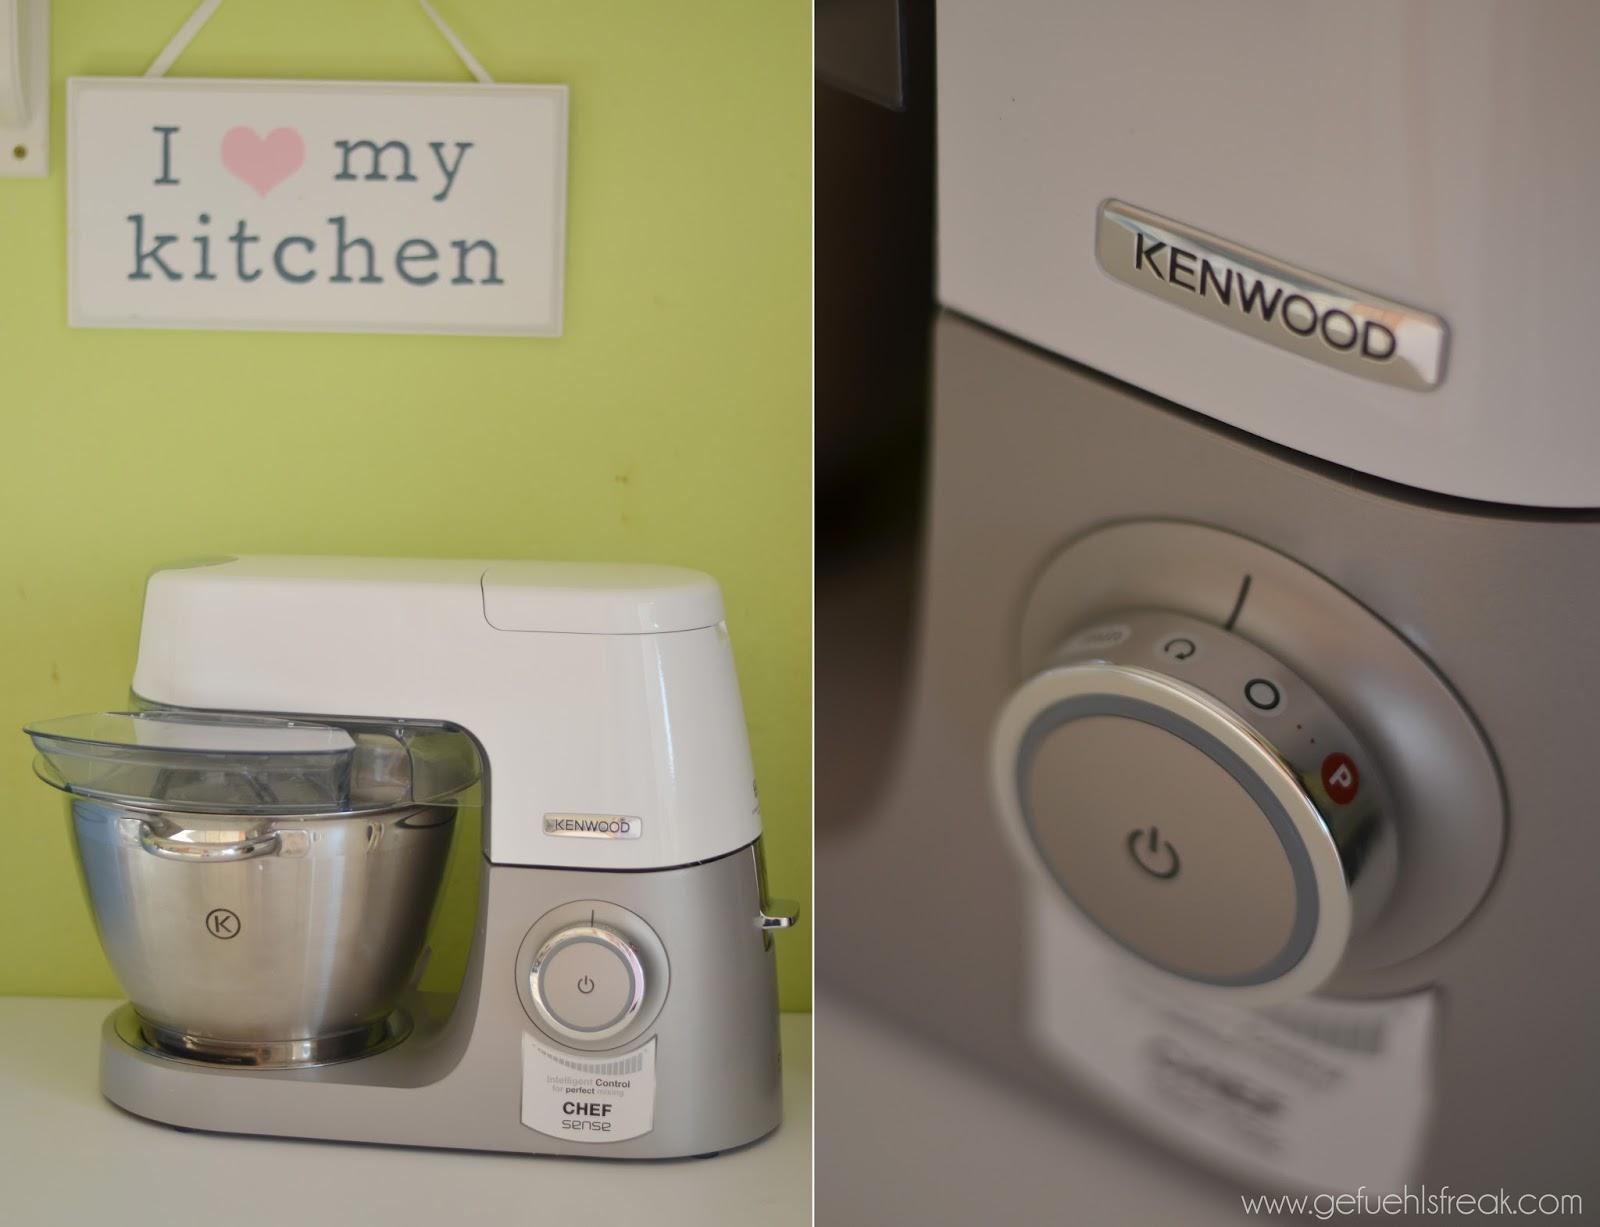 GEFUEHLSFREAK - Lifestyle & Motherhood: Kitchen impressions with ...